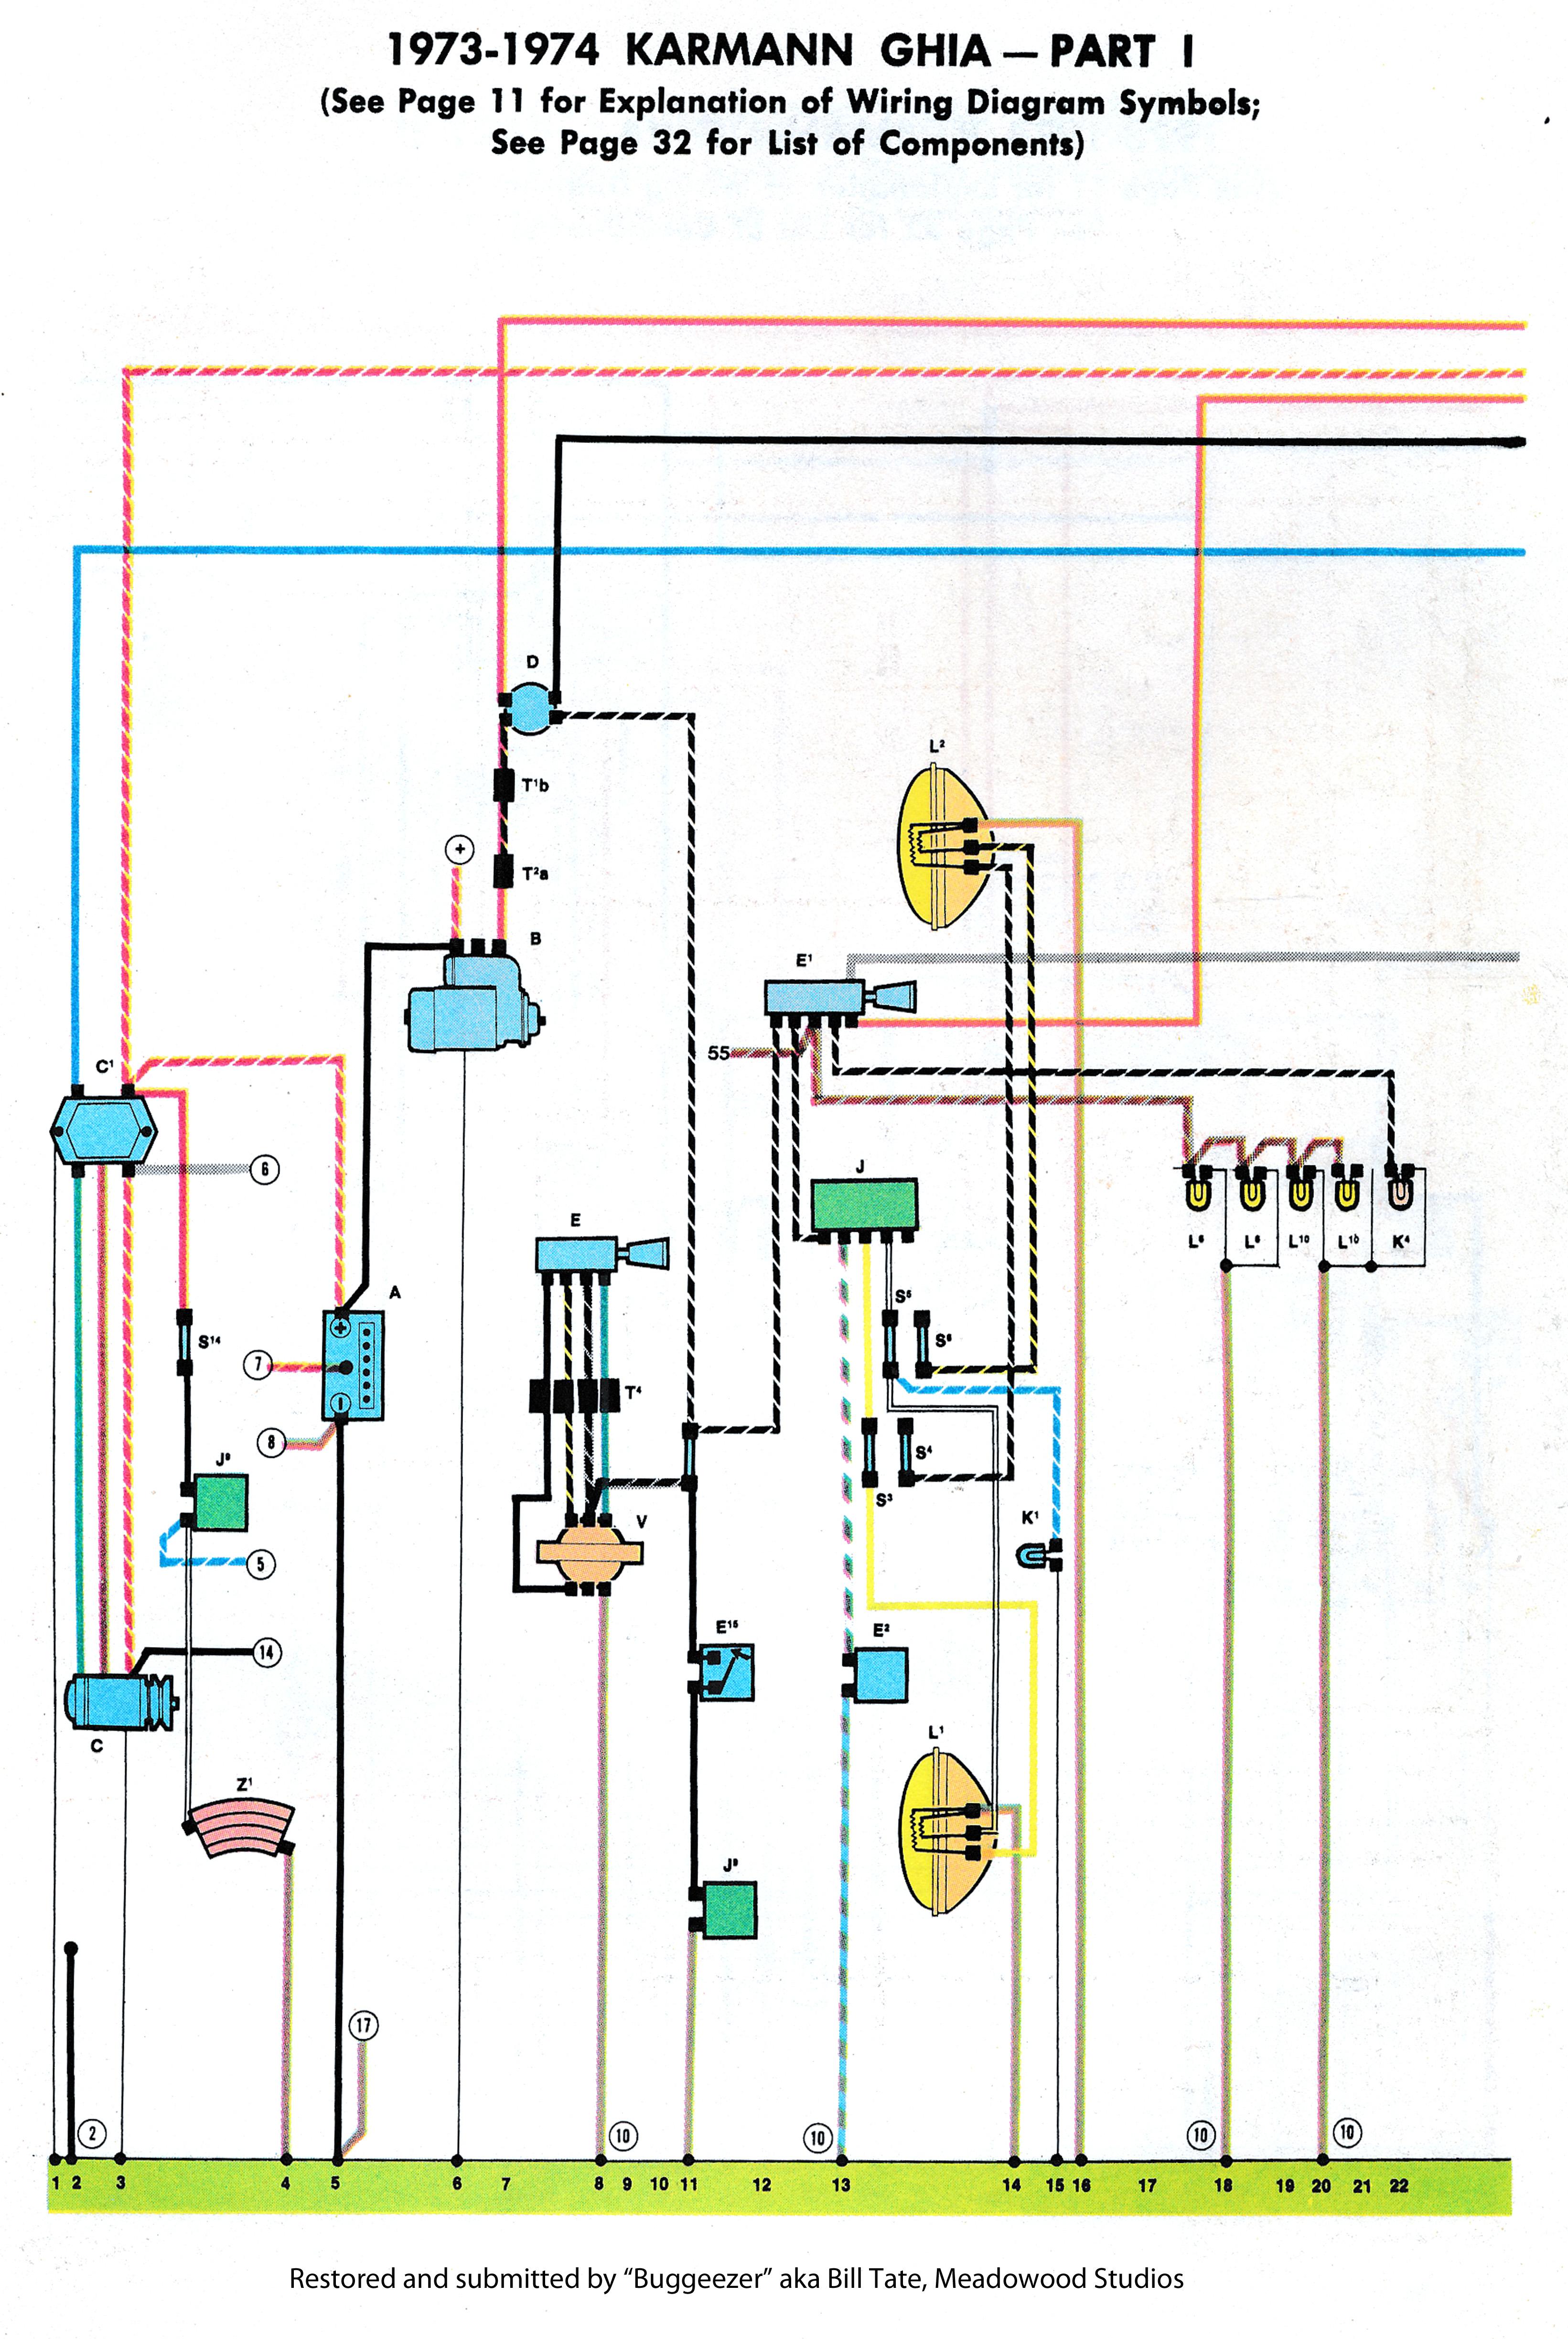 74 Volkswagen Karmann Ghia Directional Wiring Diagram